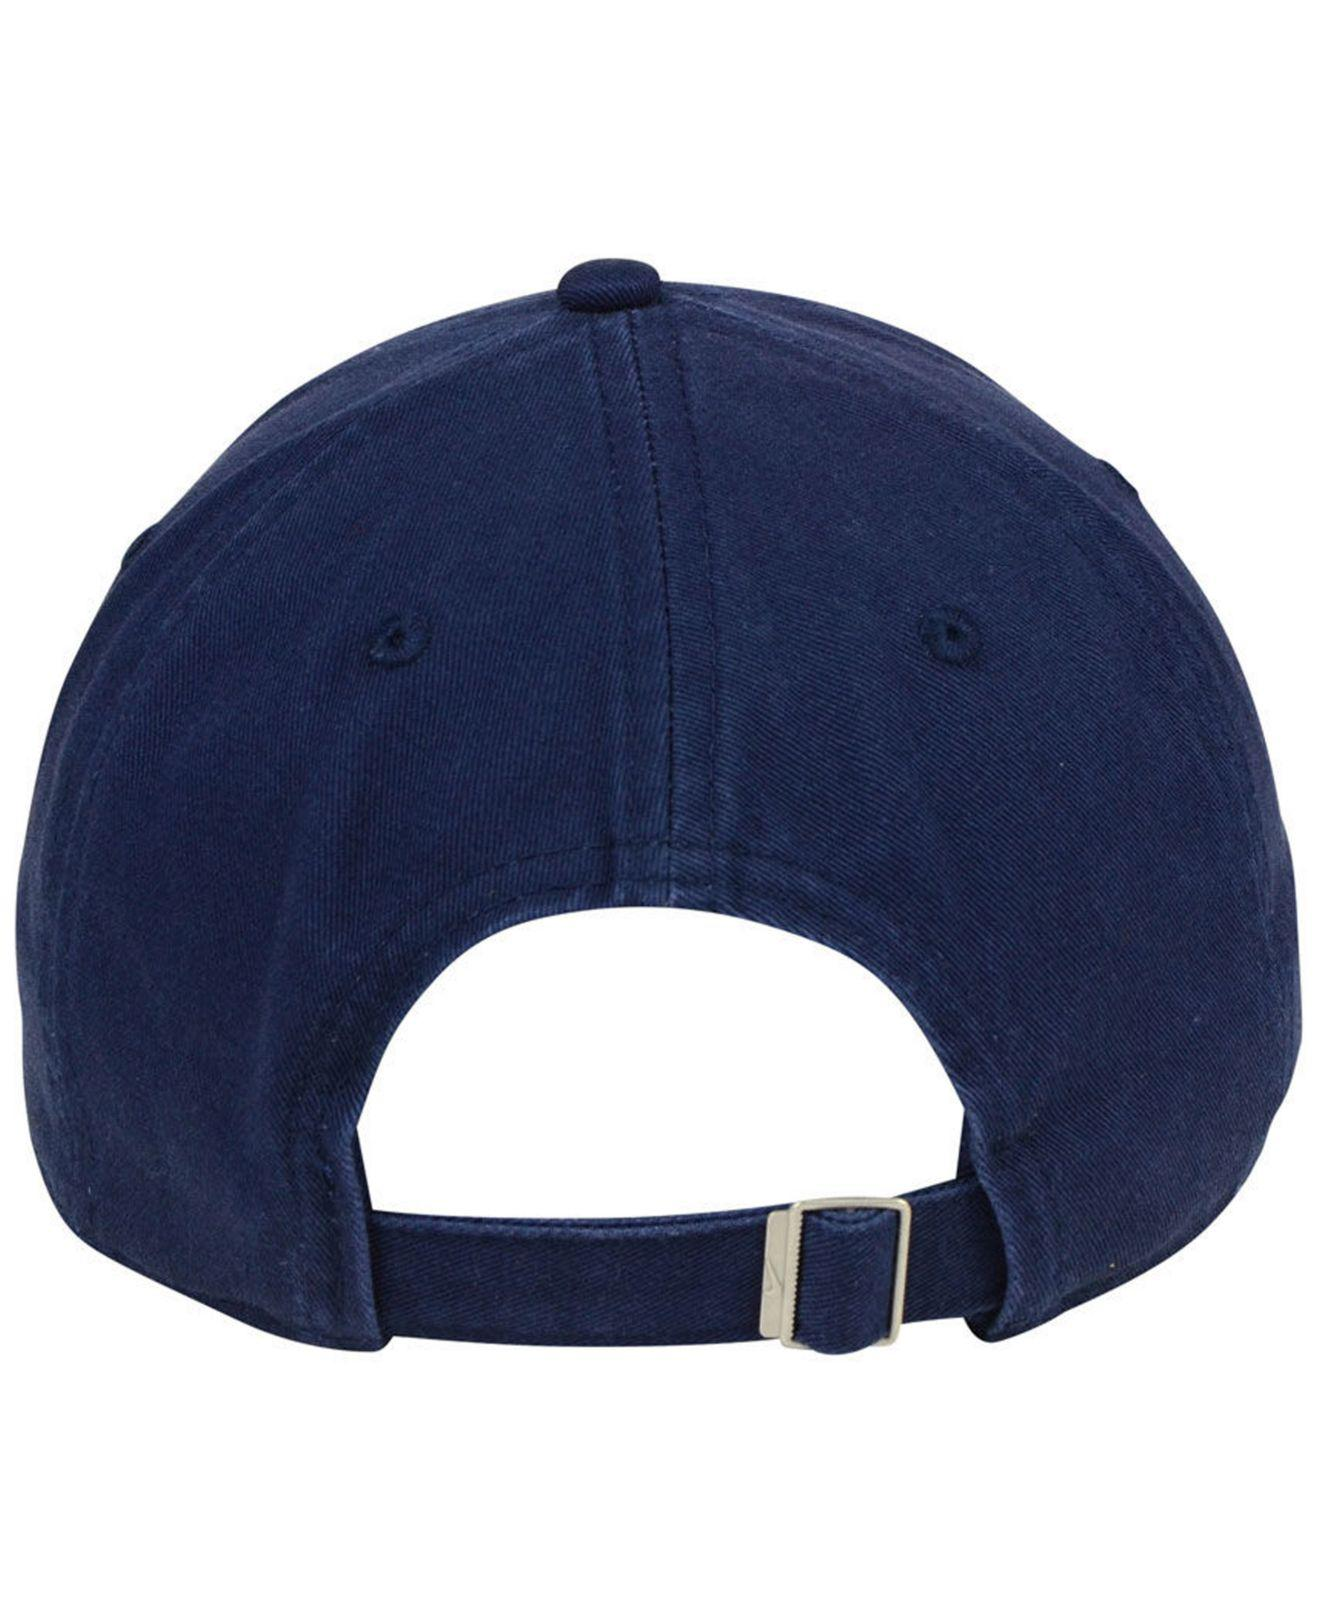 4b398ec4 ... wholesale lyst nike houston astros micro cap in blue for men 3d7f4 ae8de